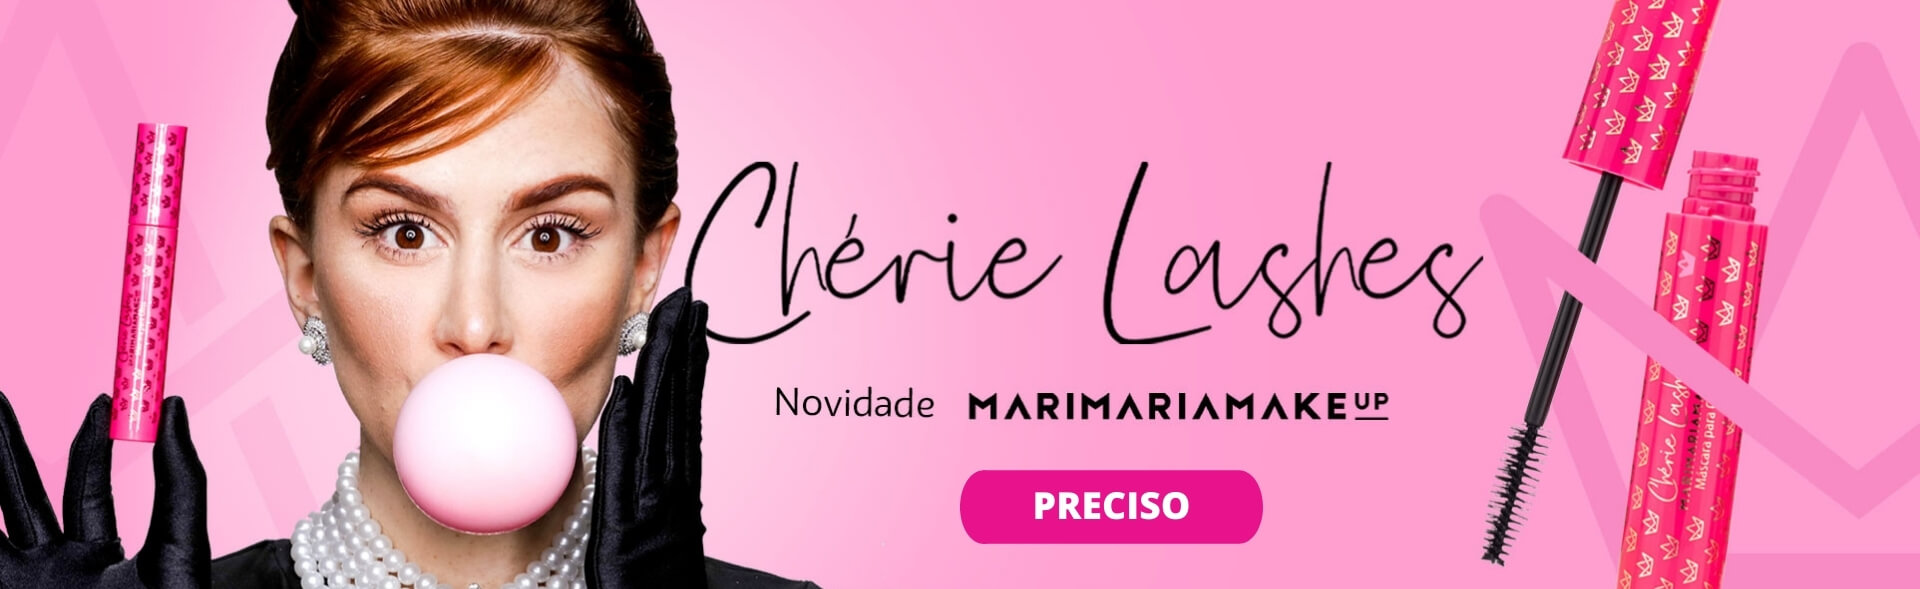 Cherie Lashes